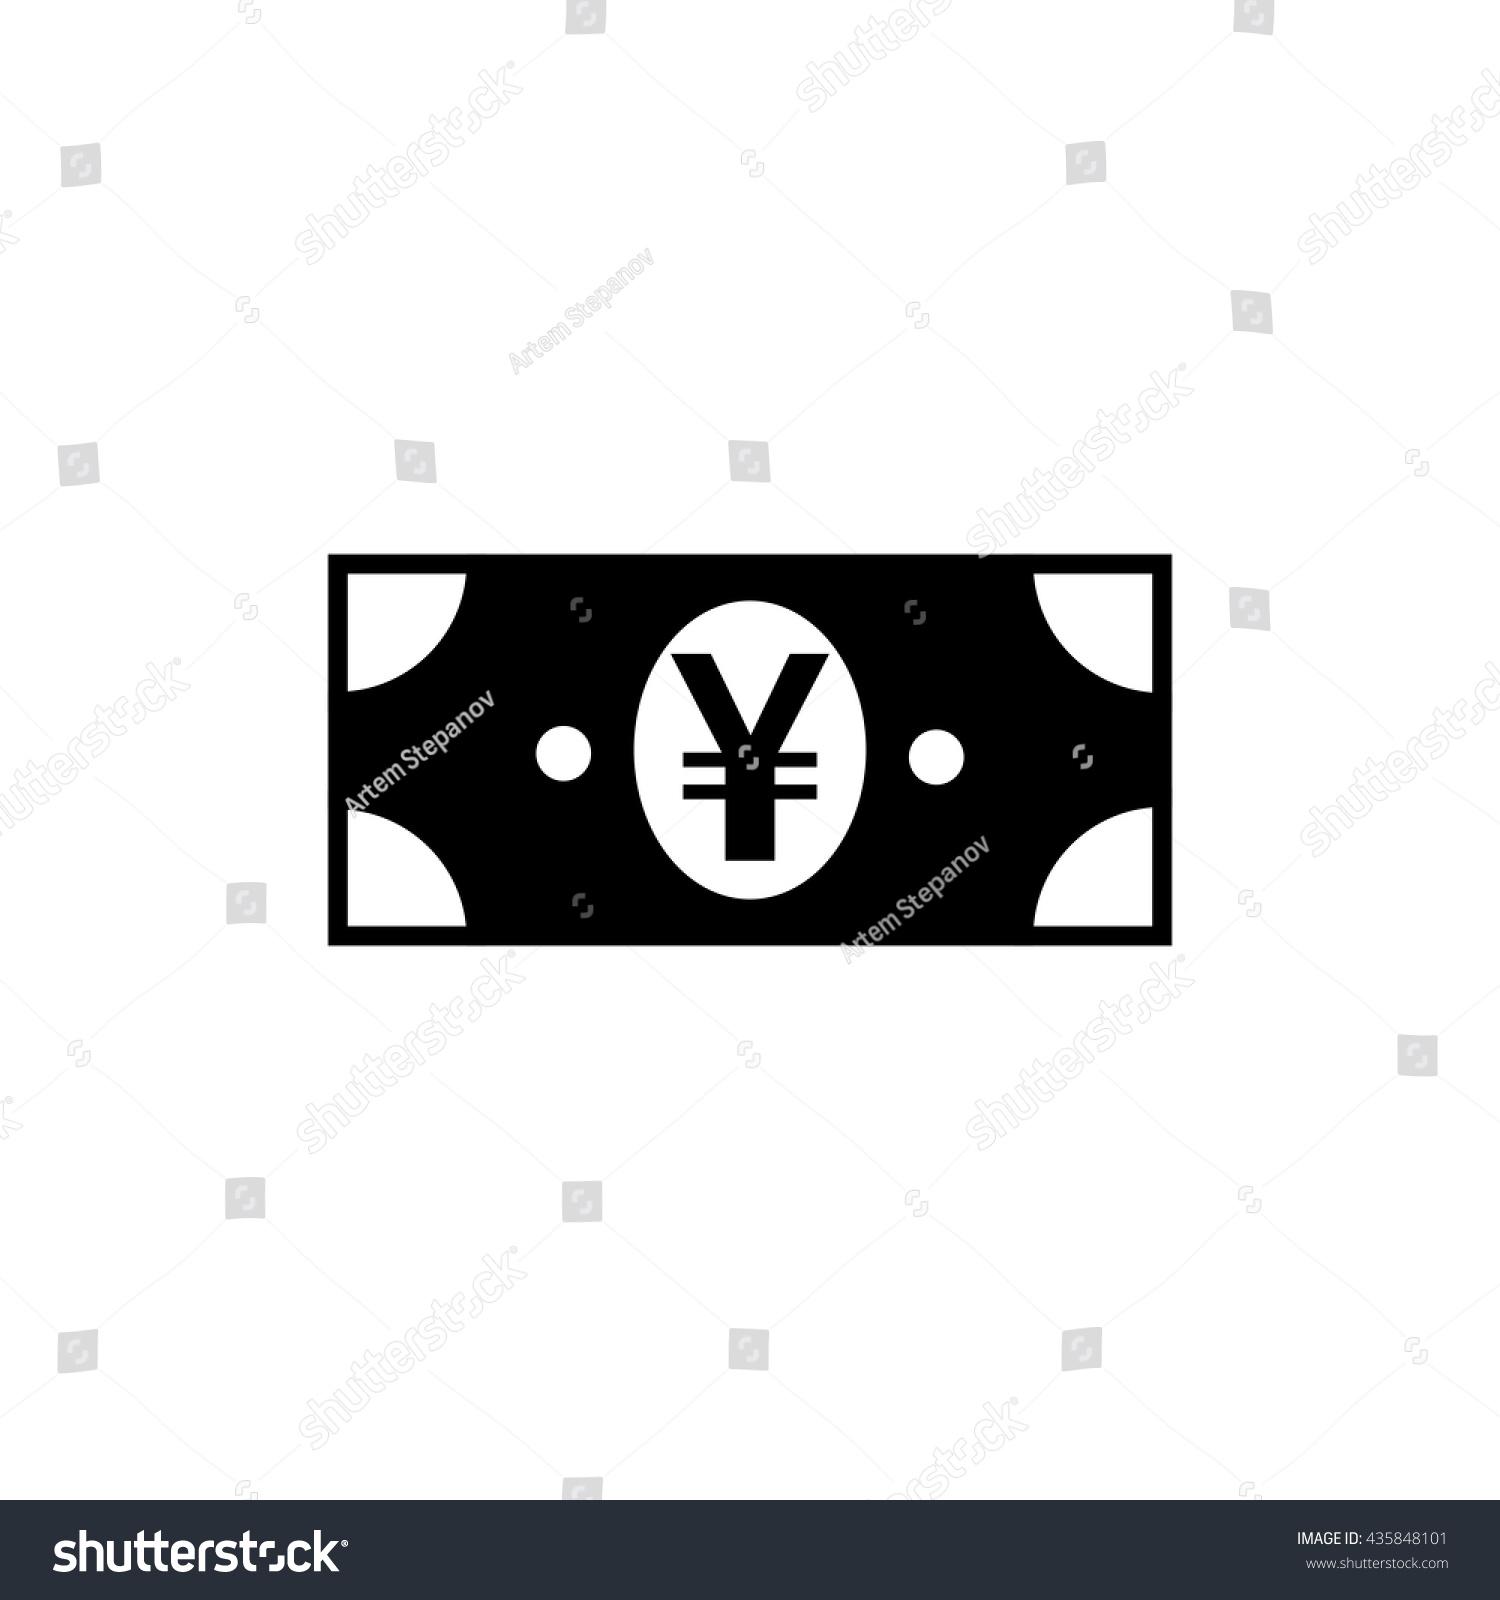 China yuan symbol images symbol and sign ideas chinese yen currency symbol view symbol buycottarizona images biocorpaavc Choice Image